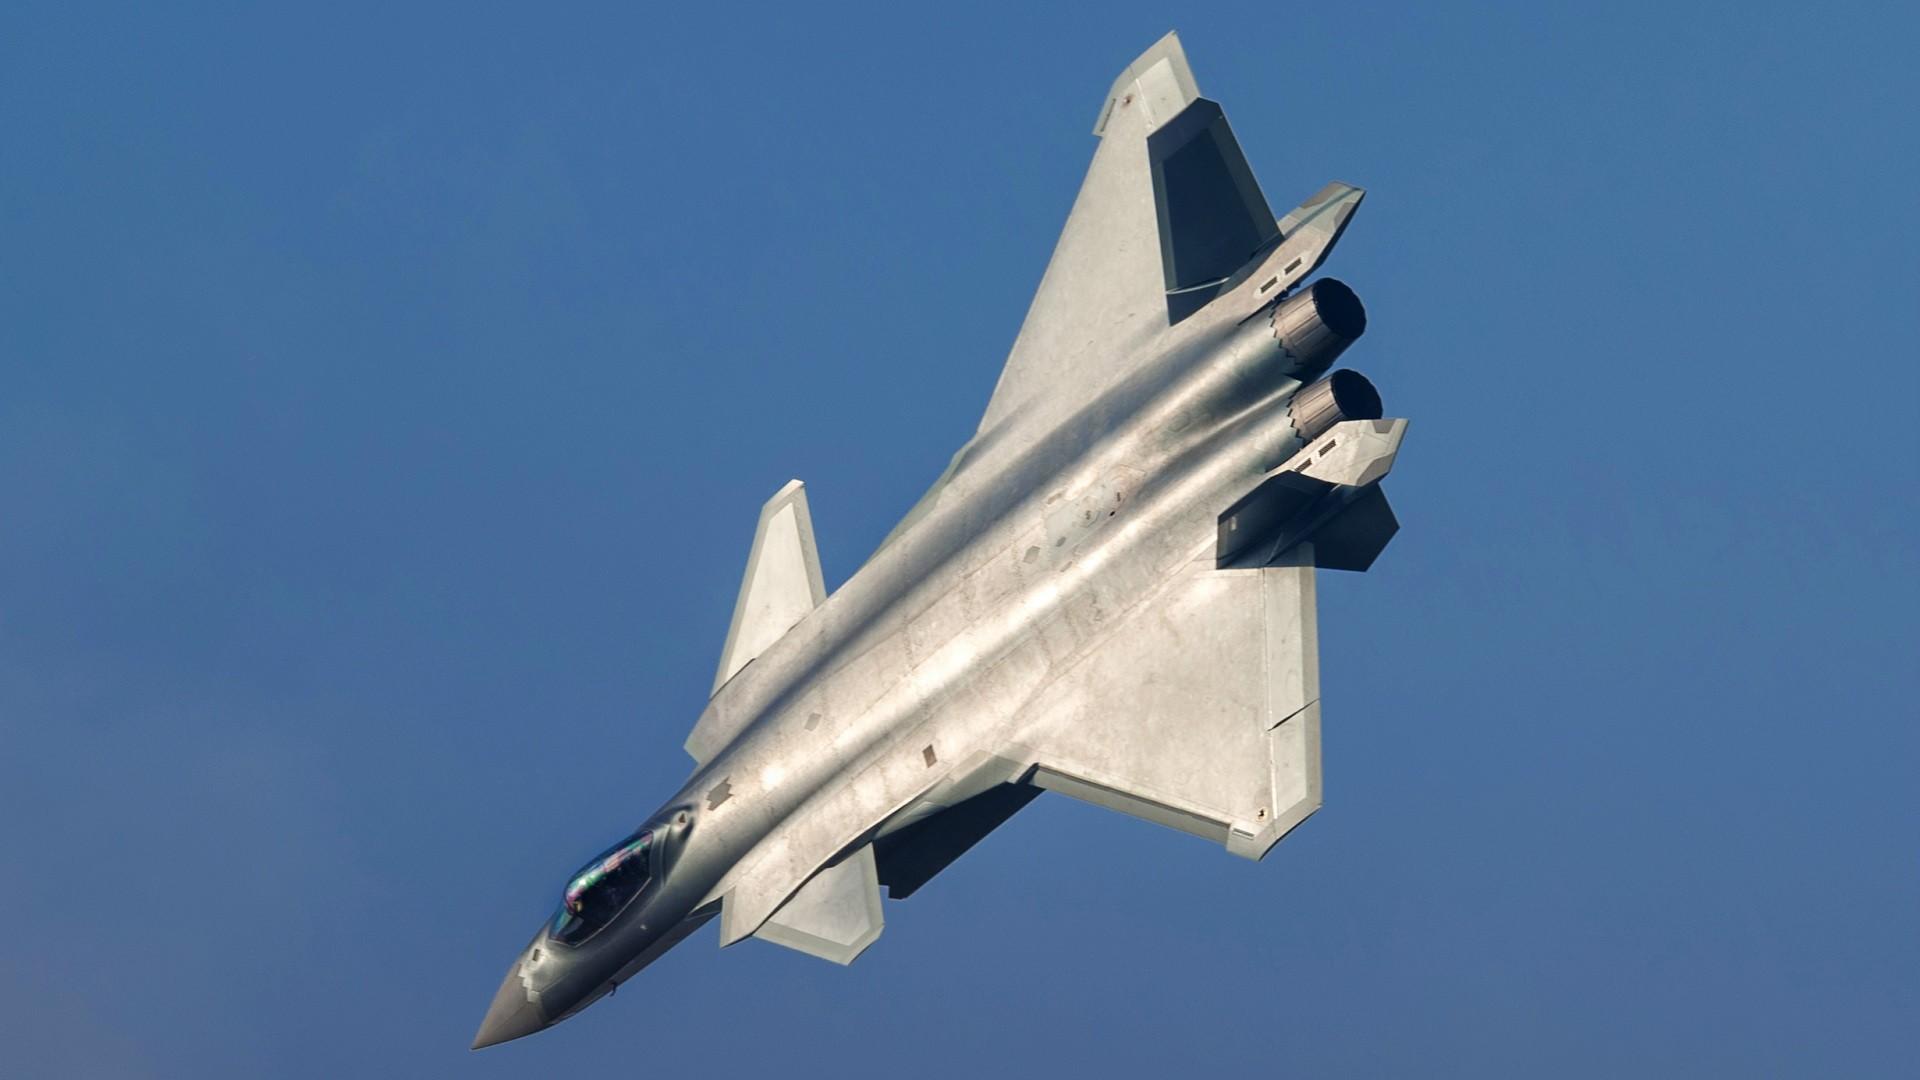 Aereo Da Combattimento Cinese : Sfondi veicolo aereo aerei militari plaaf j